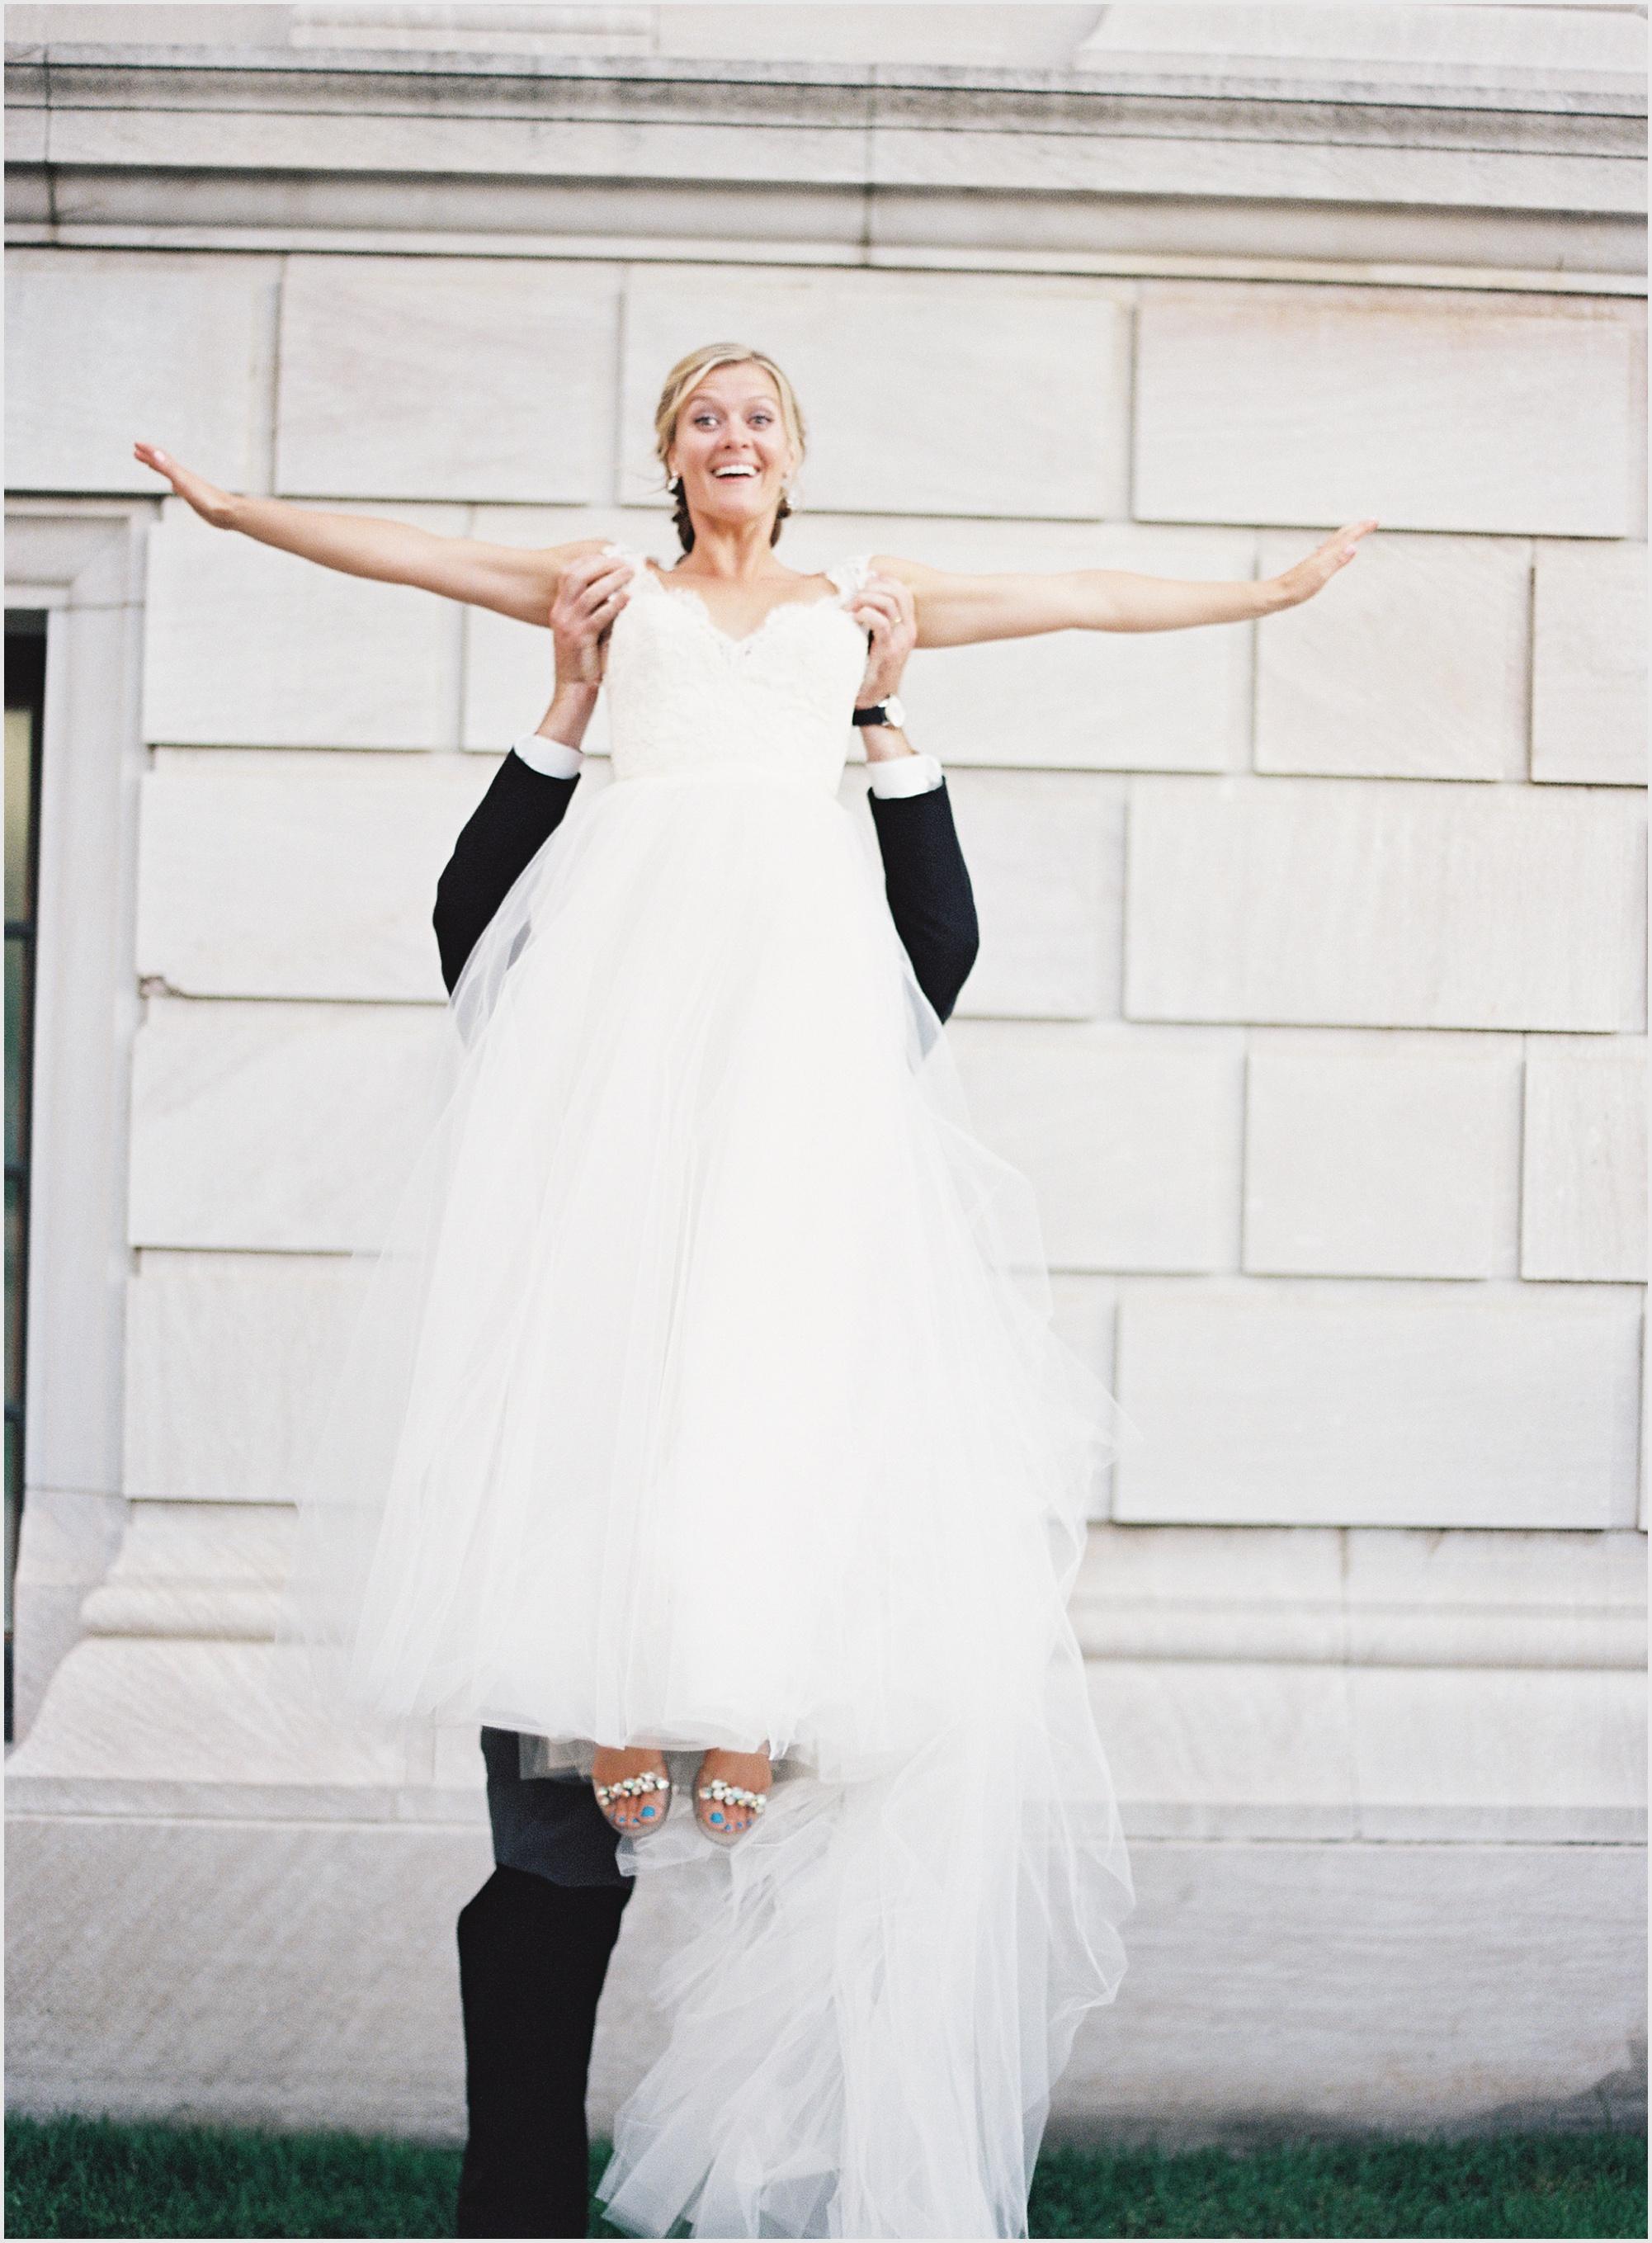 maura_david_james_j_hill_wedding_lucas_botz_photography_054.jpg